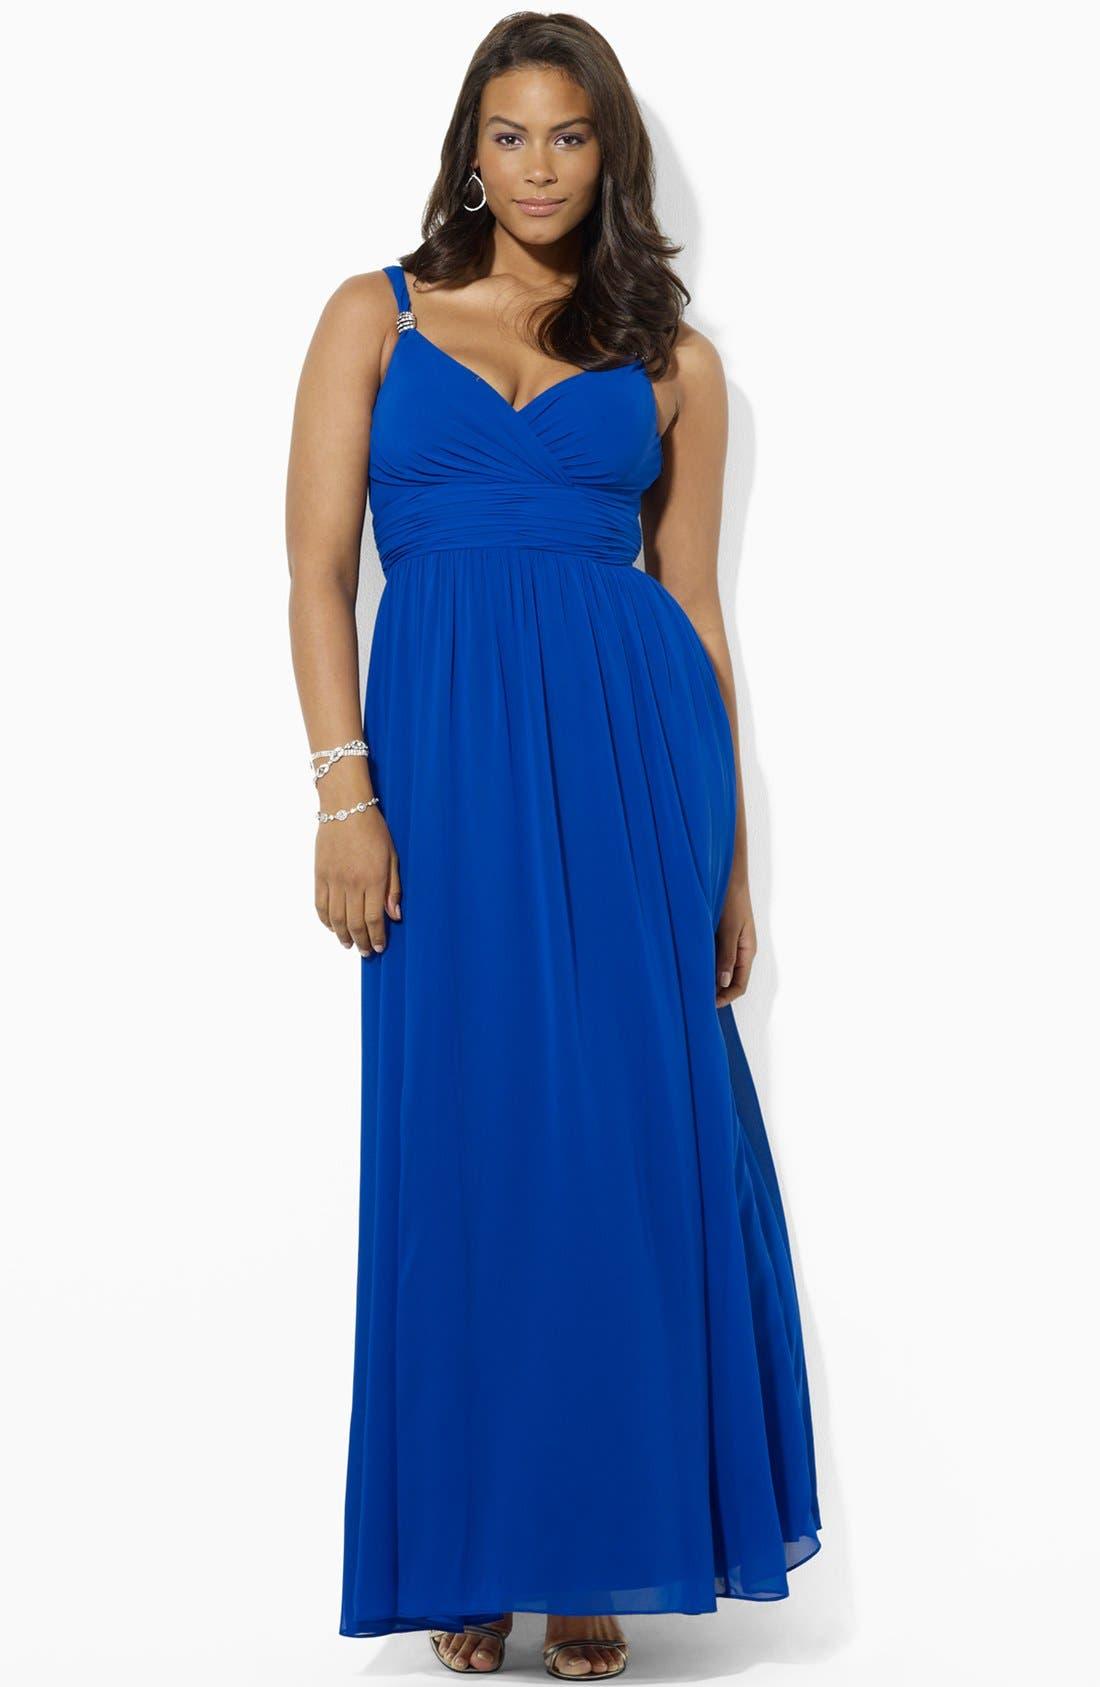 Main Image - Lauren Ralph Lauren Embellished Surplice Chiffon Gown (Plus Size)